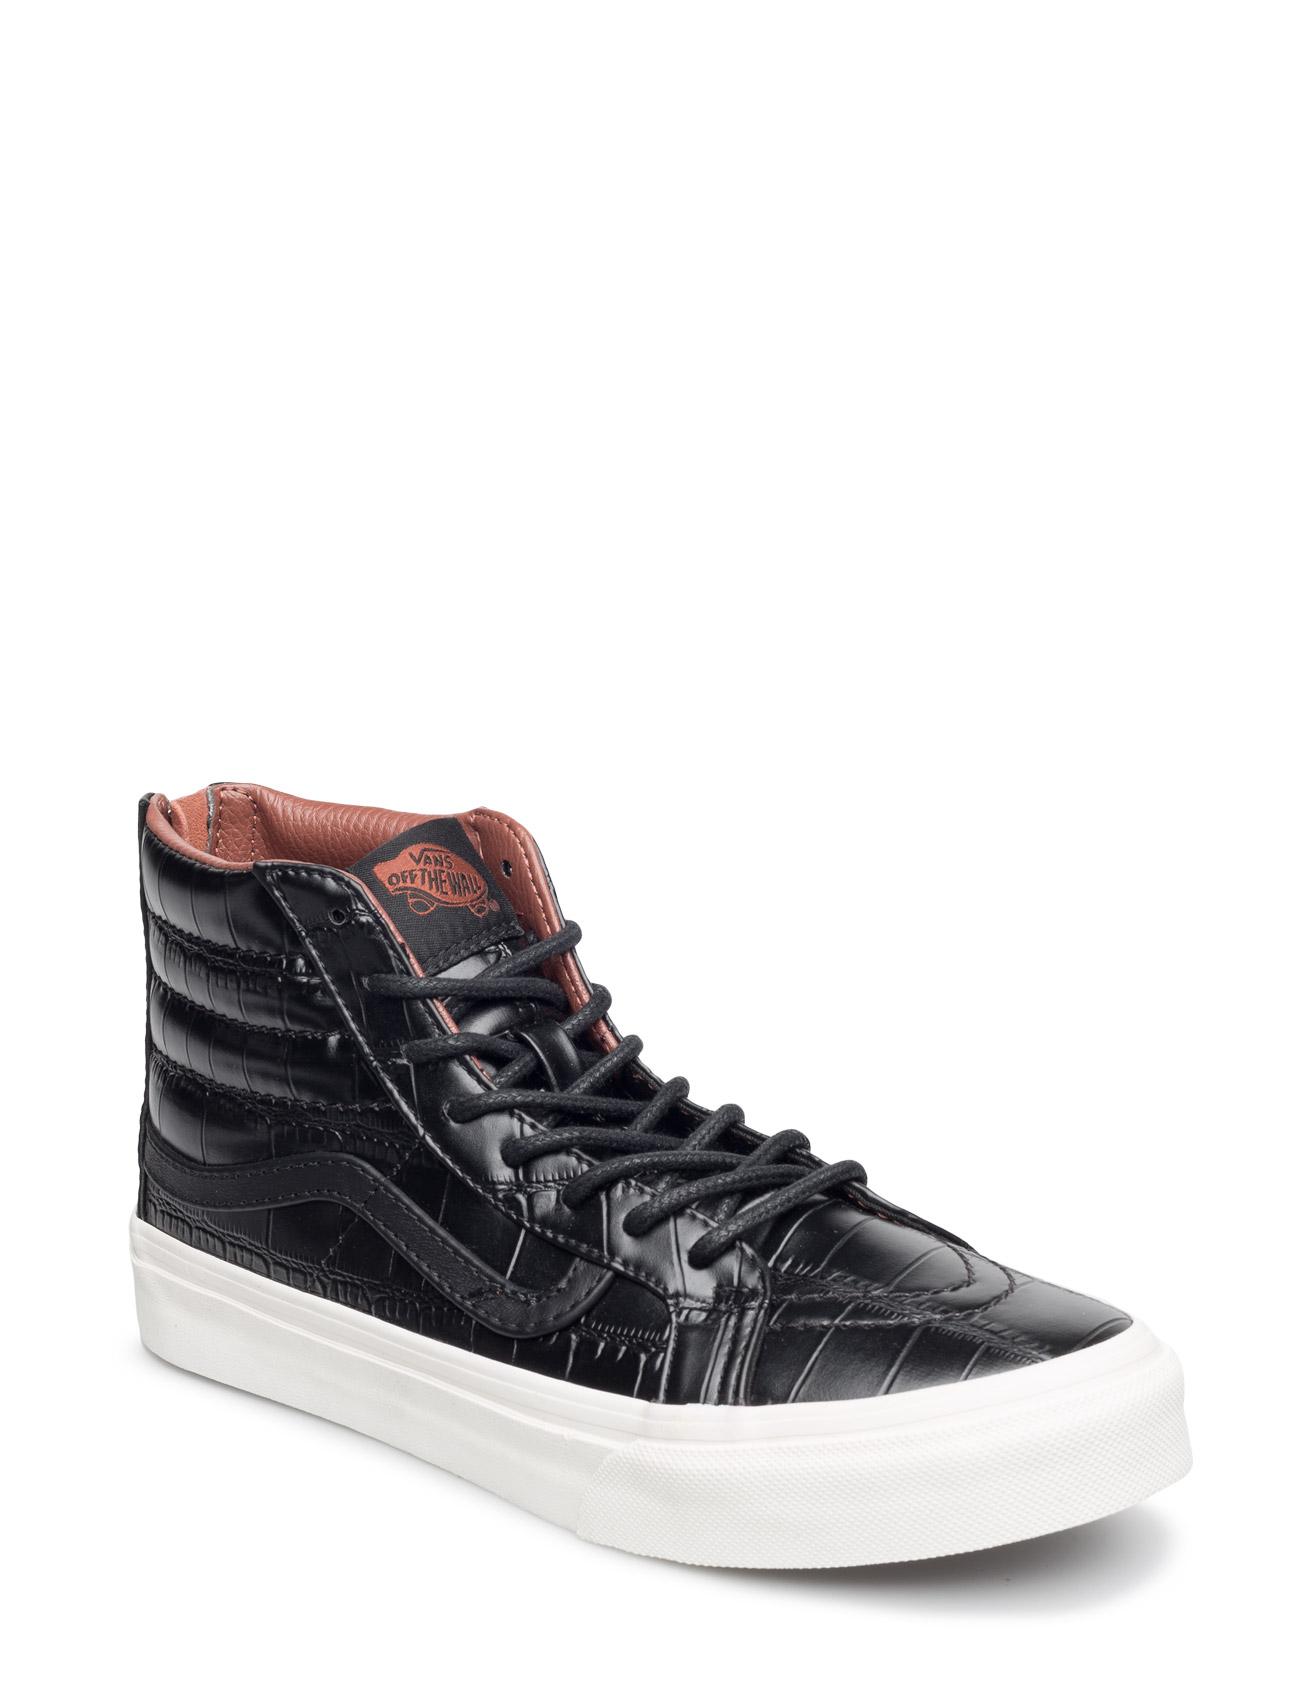 (Croc Leather)